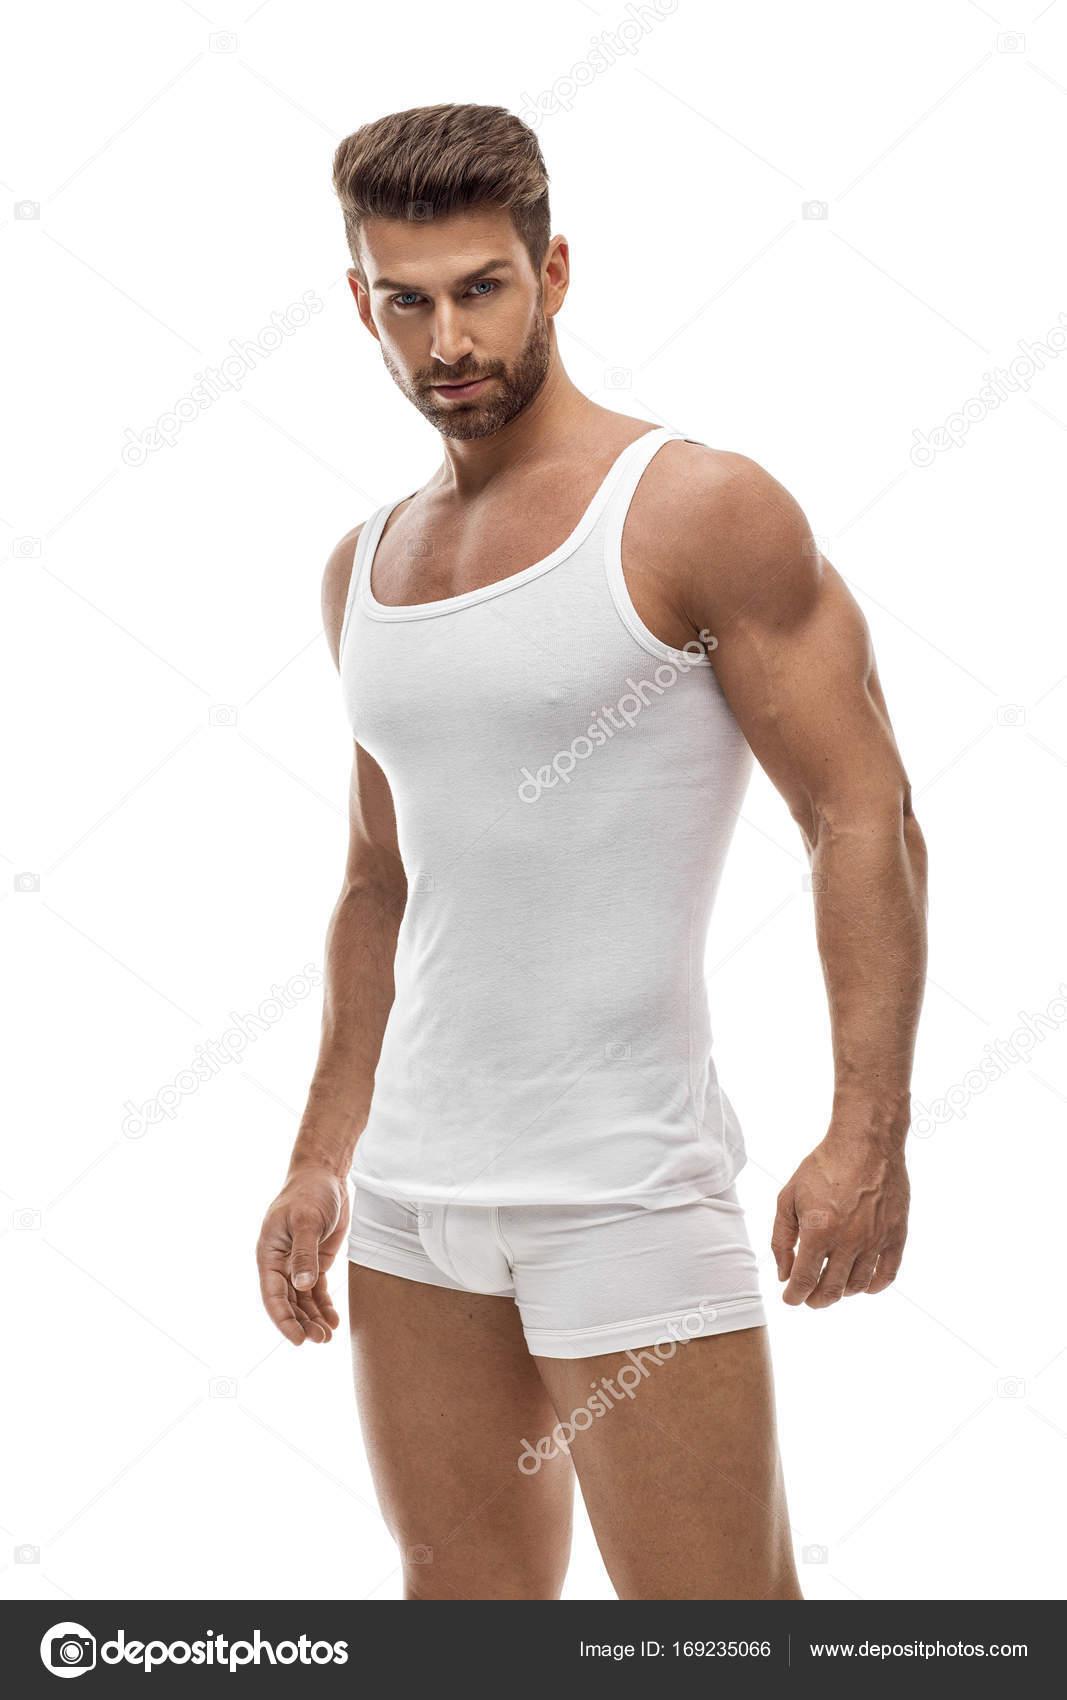 db0bed4224 Modelo masculino sexy en ropa interior — Foto de Stock